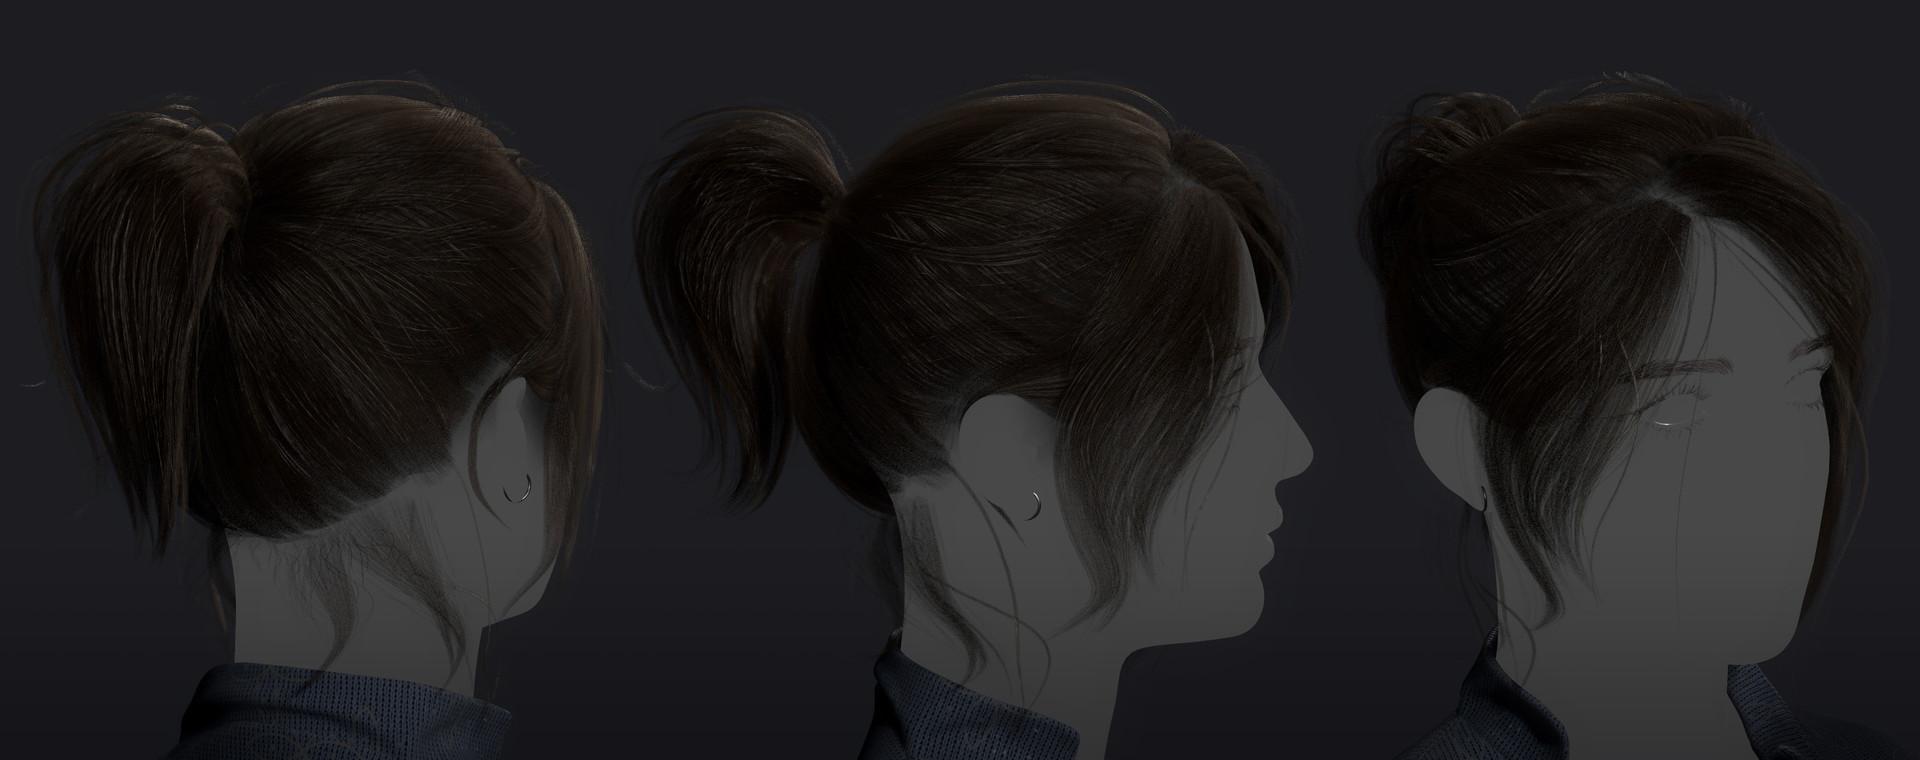 Saurabh jethani brunette 02